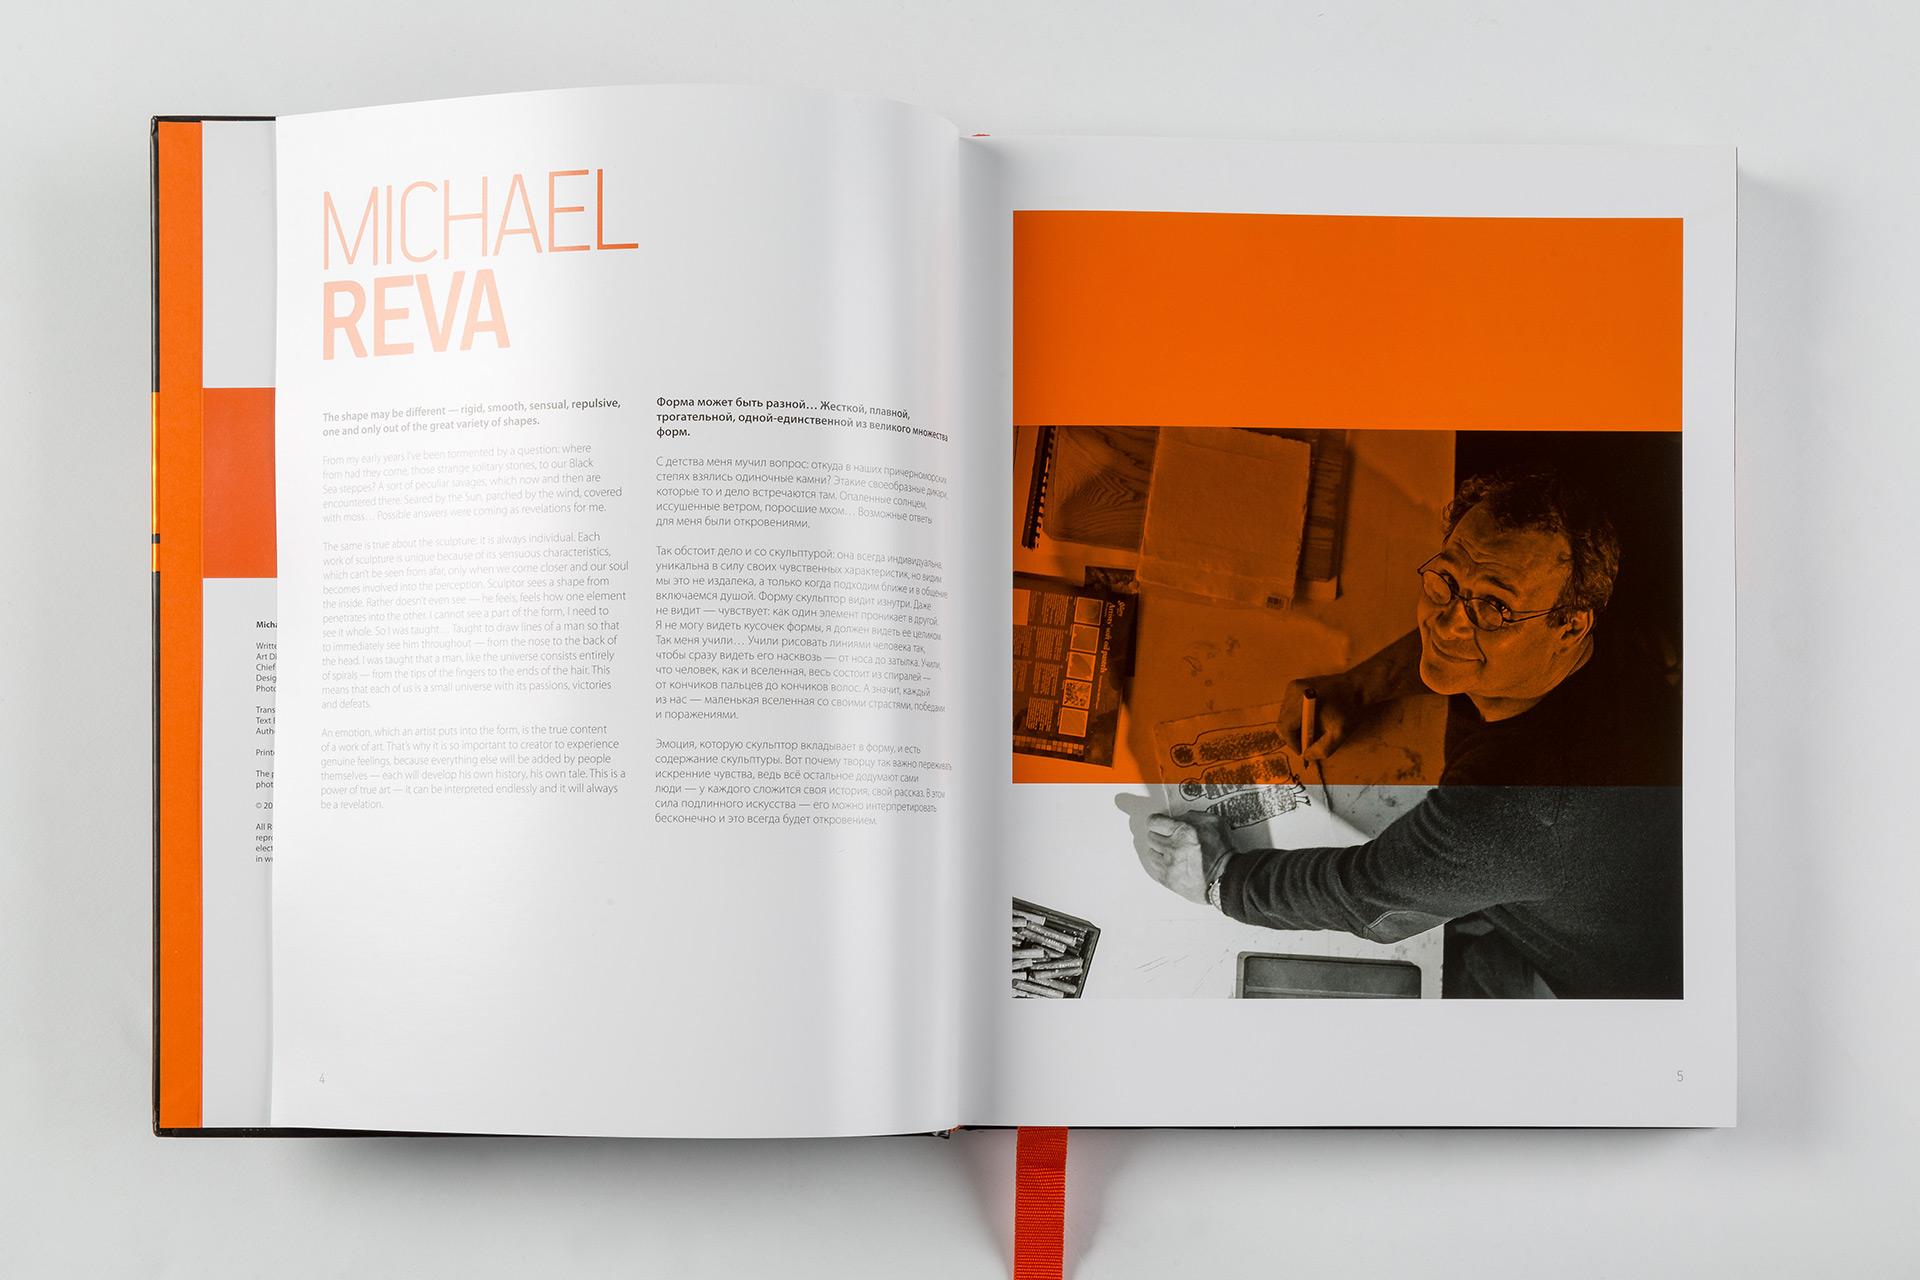 Asgard Branding, anniversary art album, design, printed publications, book design, Mikhail Reva